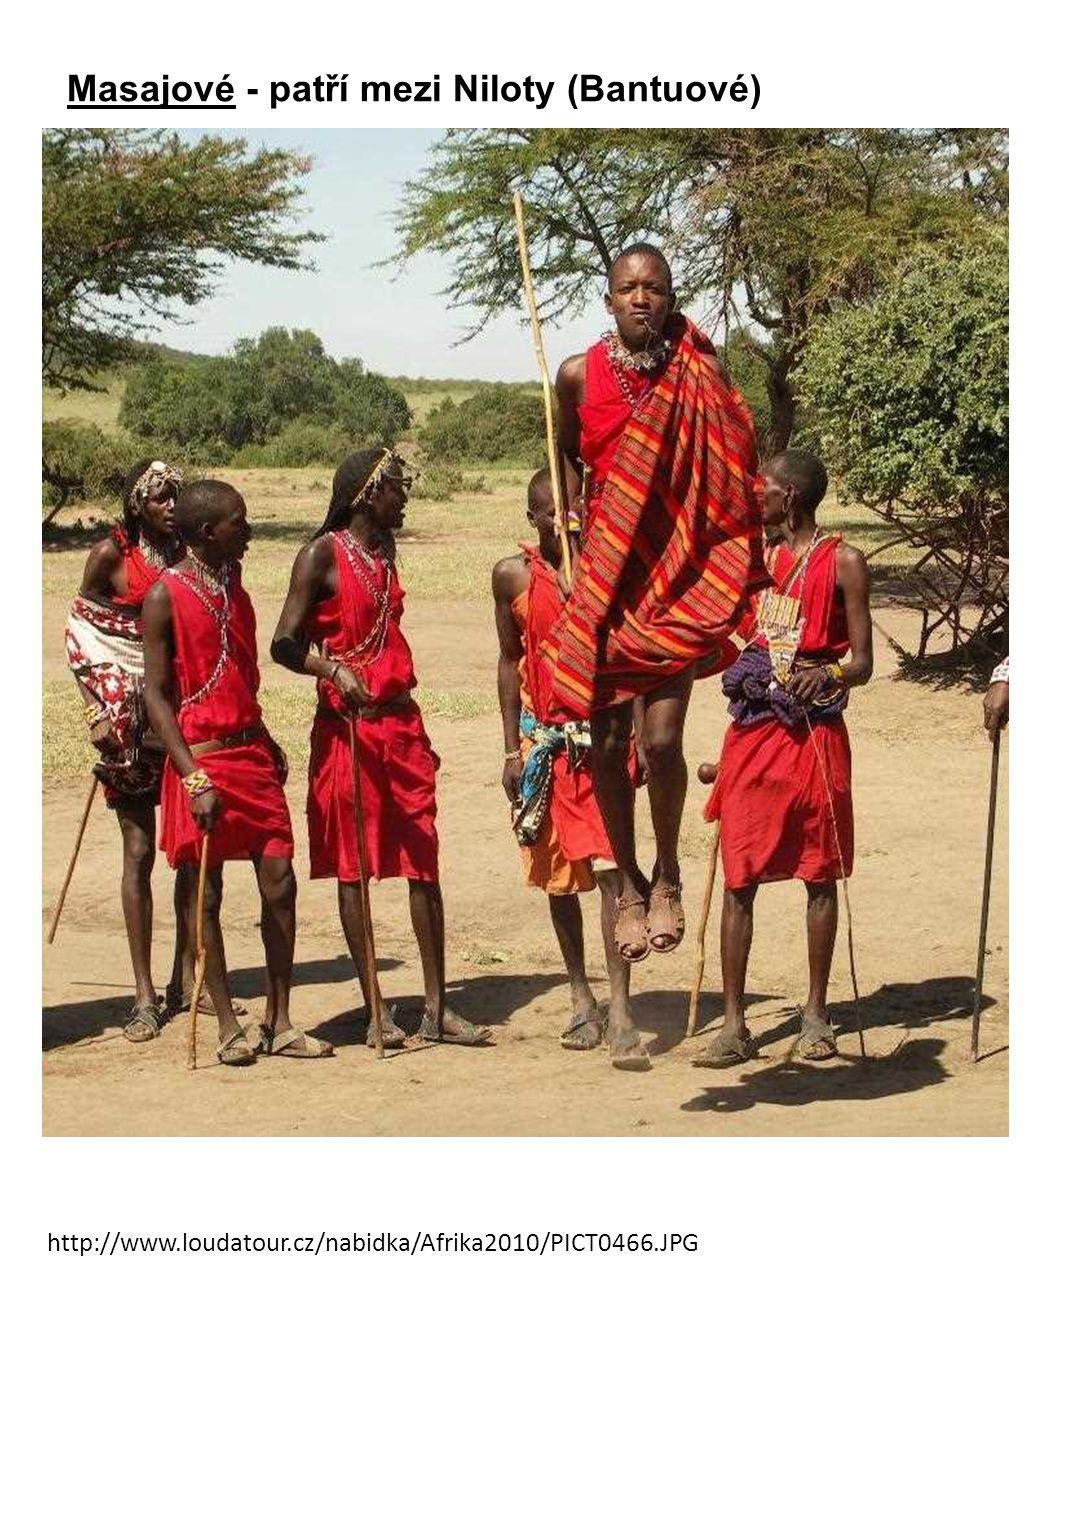 Masajové - patří mezi Niloty (Bantuové) http://www.loudatour.cz/nabidka/Afrika2010/PICT0466.JPG